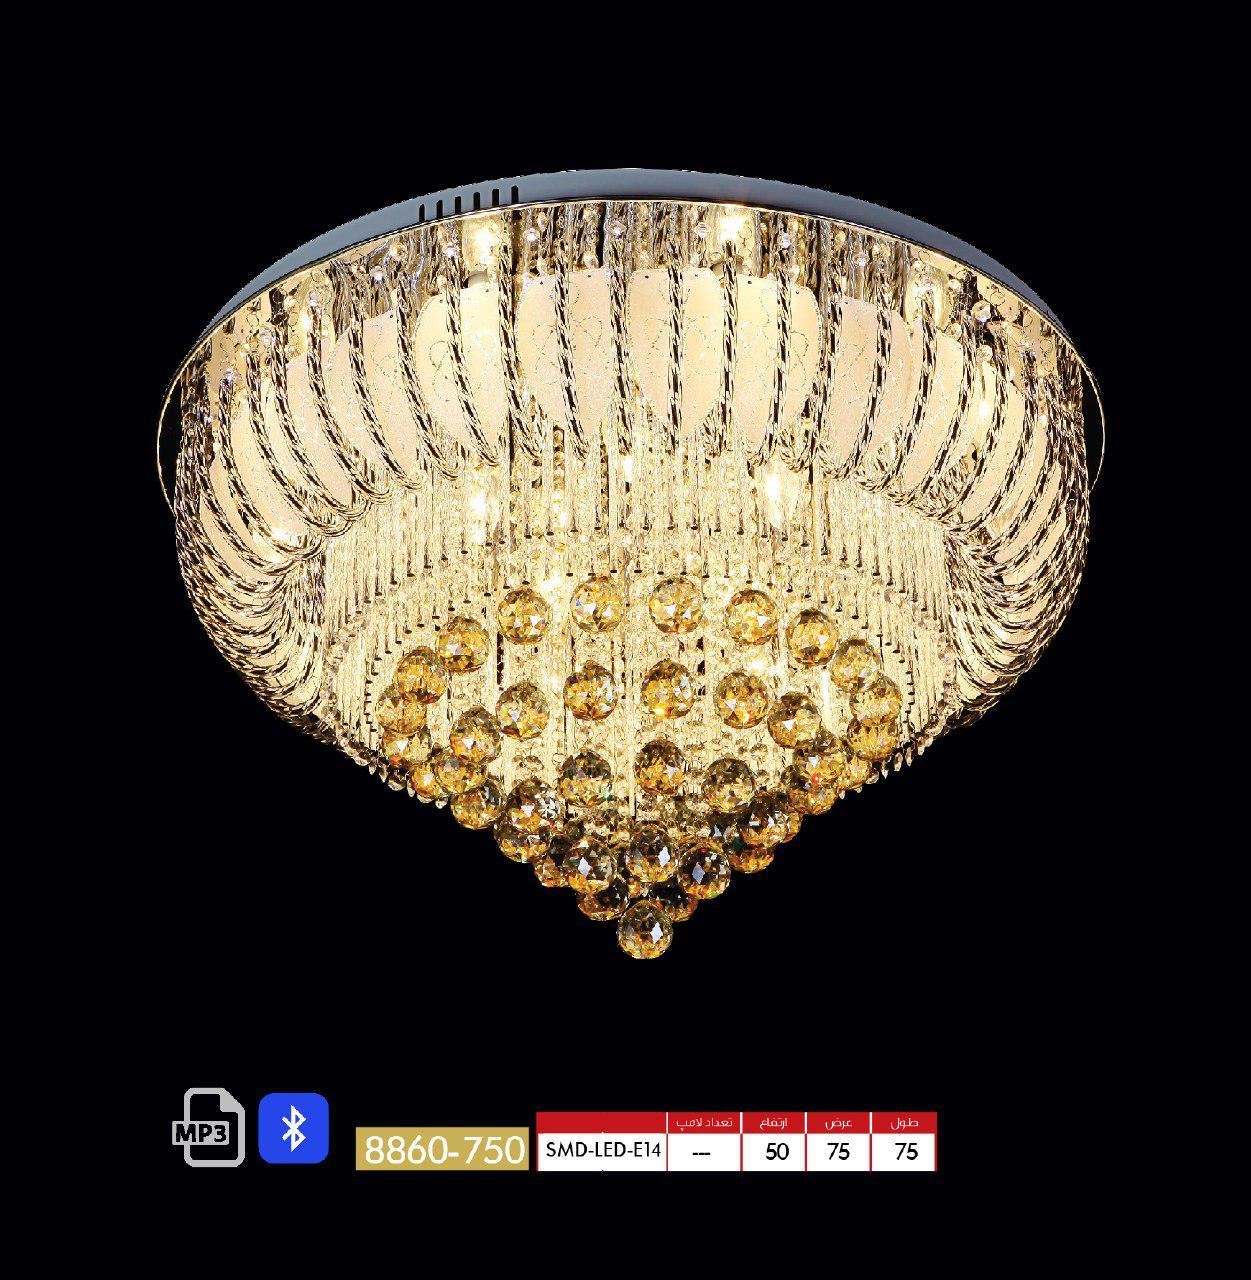 لوستر سقفی LED (کد: ۷۵۰/ ۸۸۶۰)  